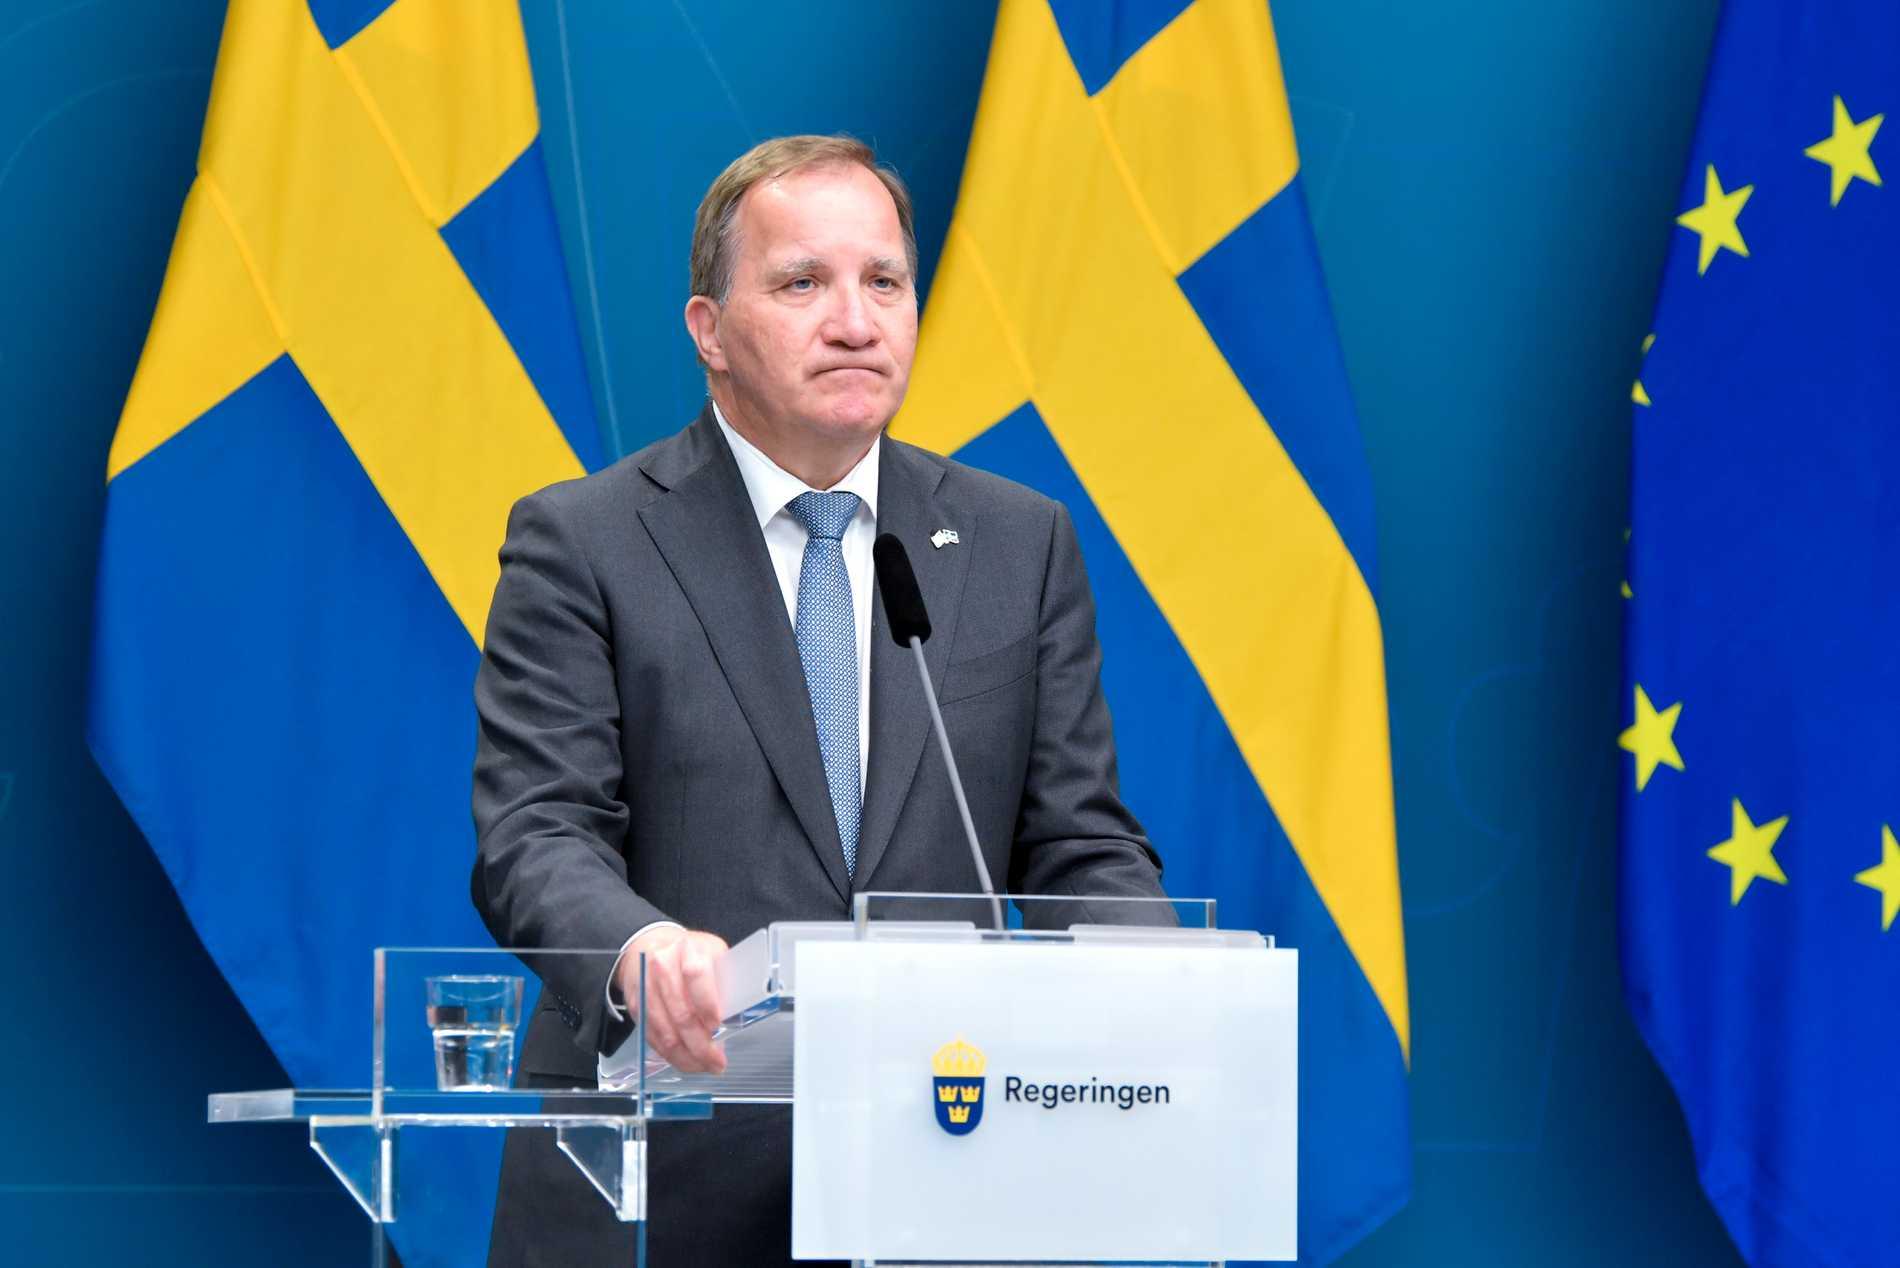 Skulle statsminister Stefan Löfven (S) utlysa extraval kan det bli en kostsam historia.